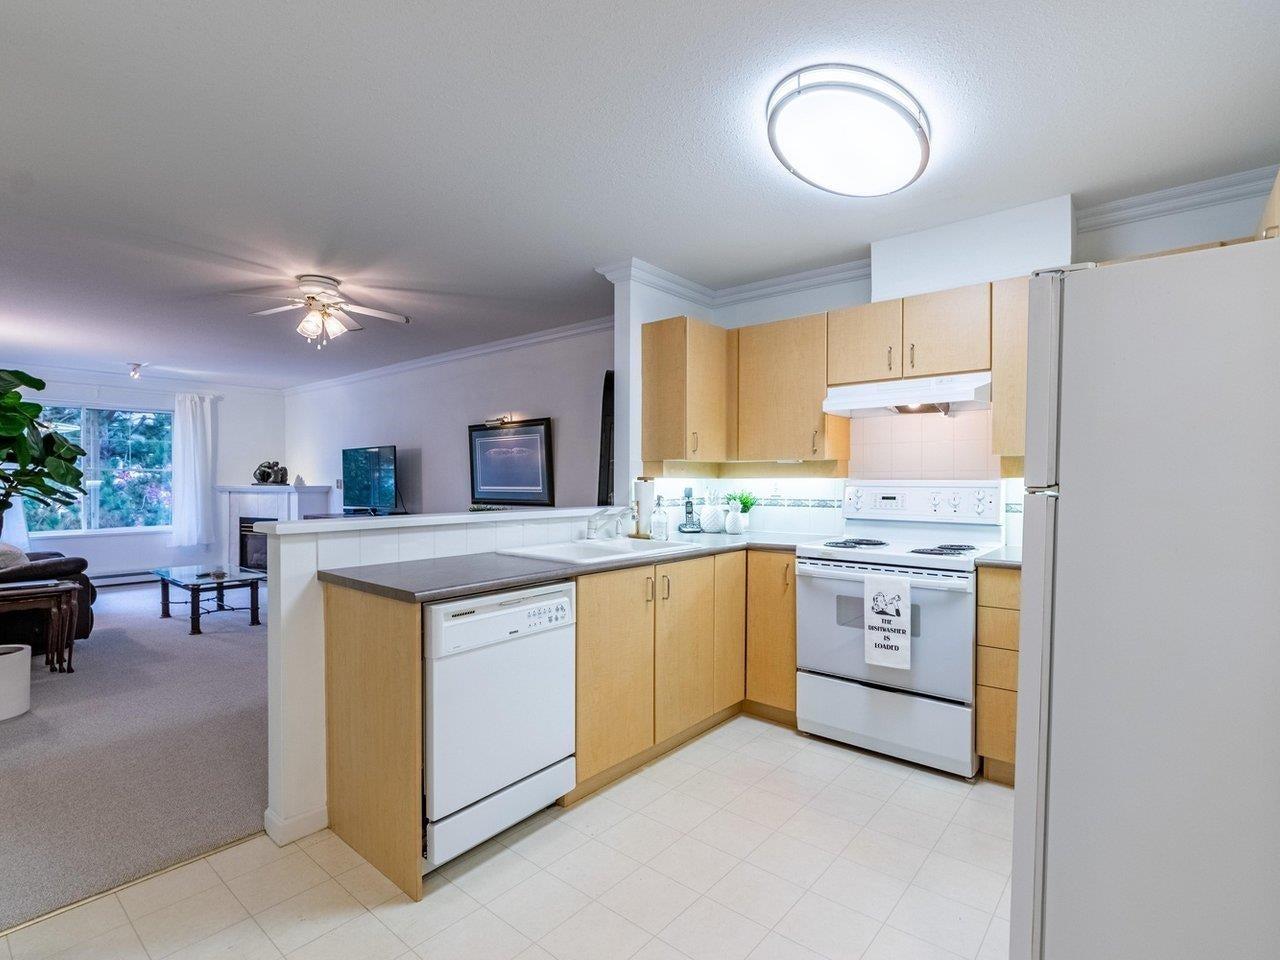 306 15298 20 AVENUE - King George Corridor Apartment/Condo for sale, 2 Bedrooms (R2625551) - #6